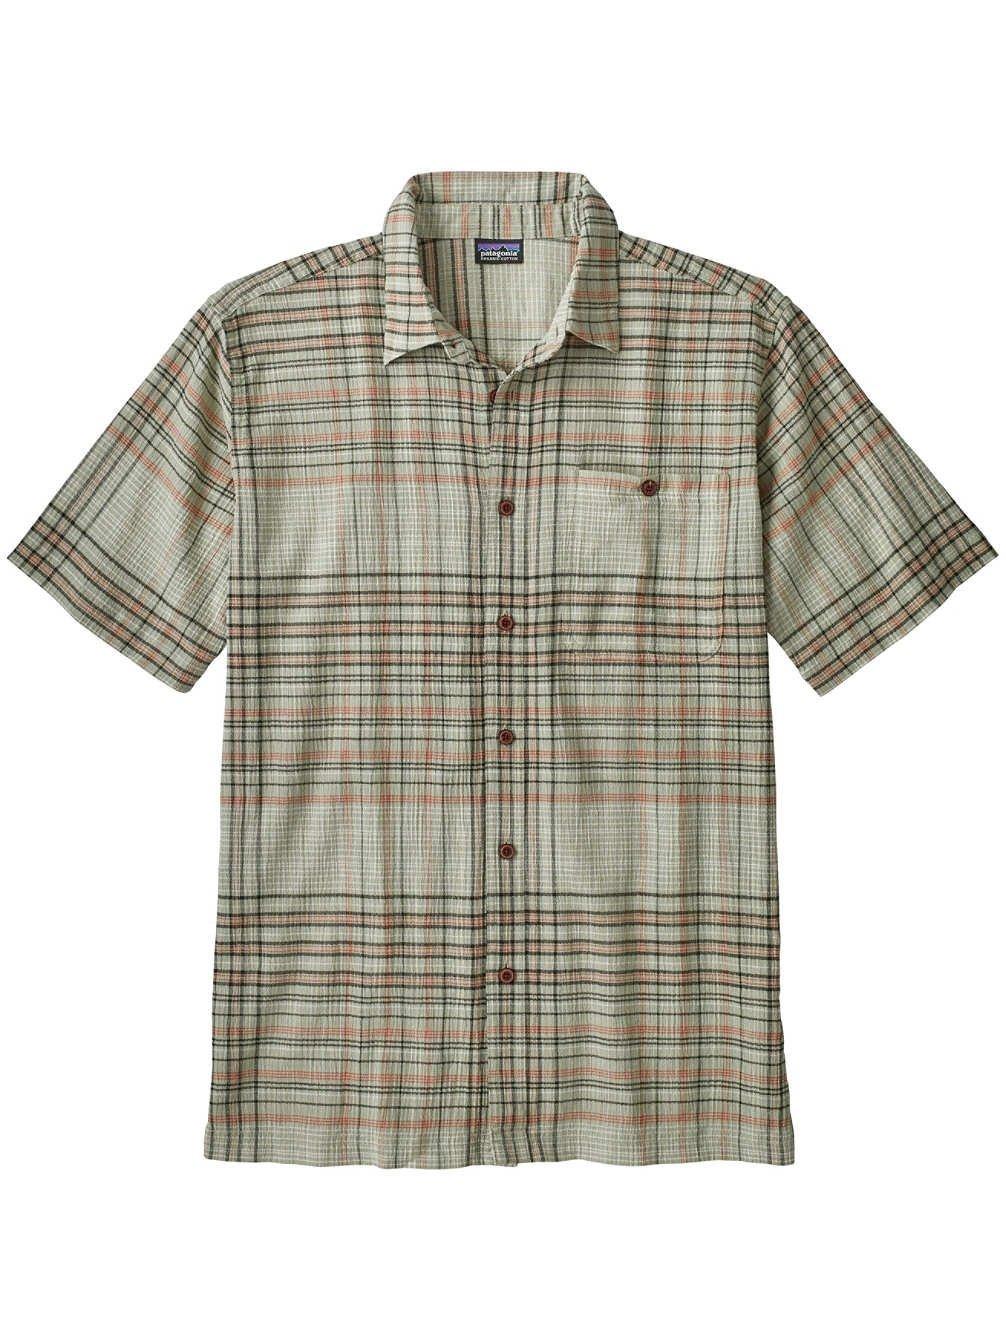 Patagonia M 'S A/C Shirt, Herren